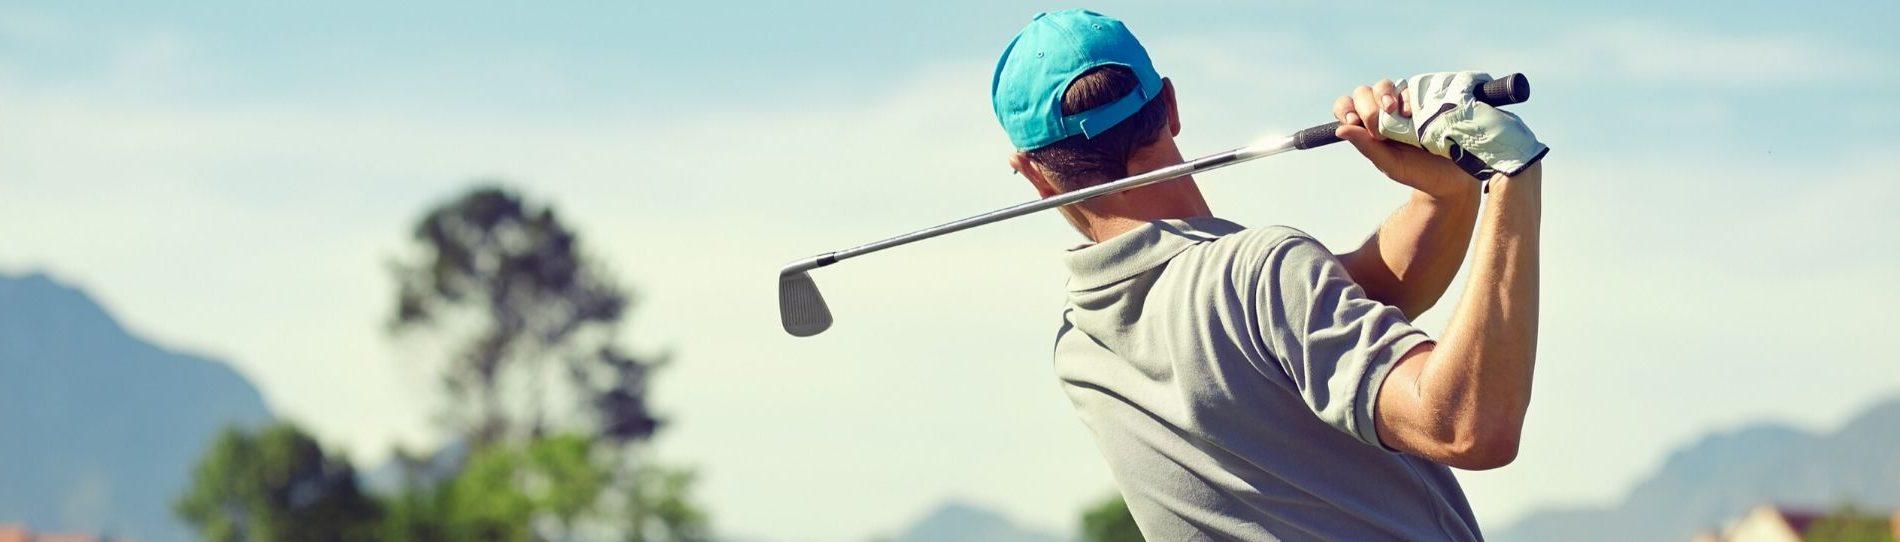 brisbane bucks golf and girls package